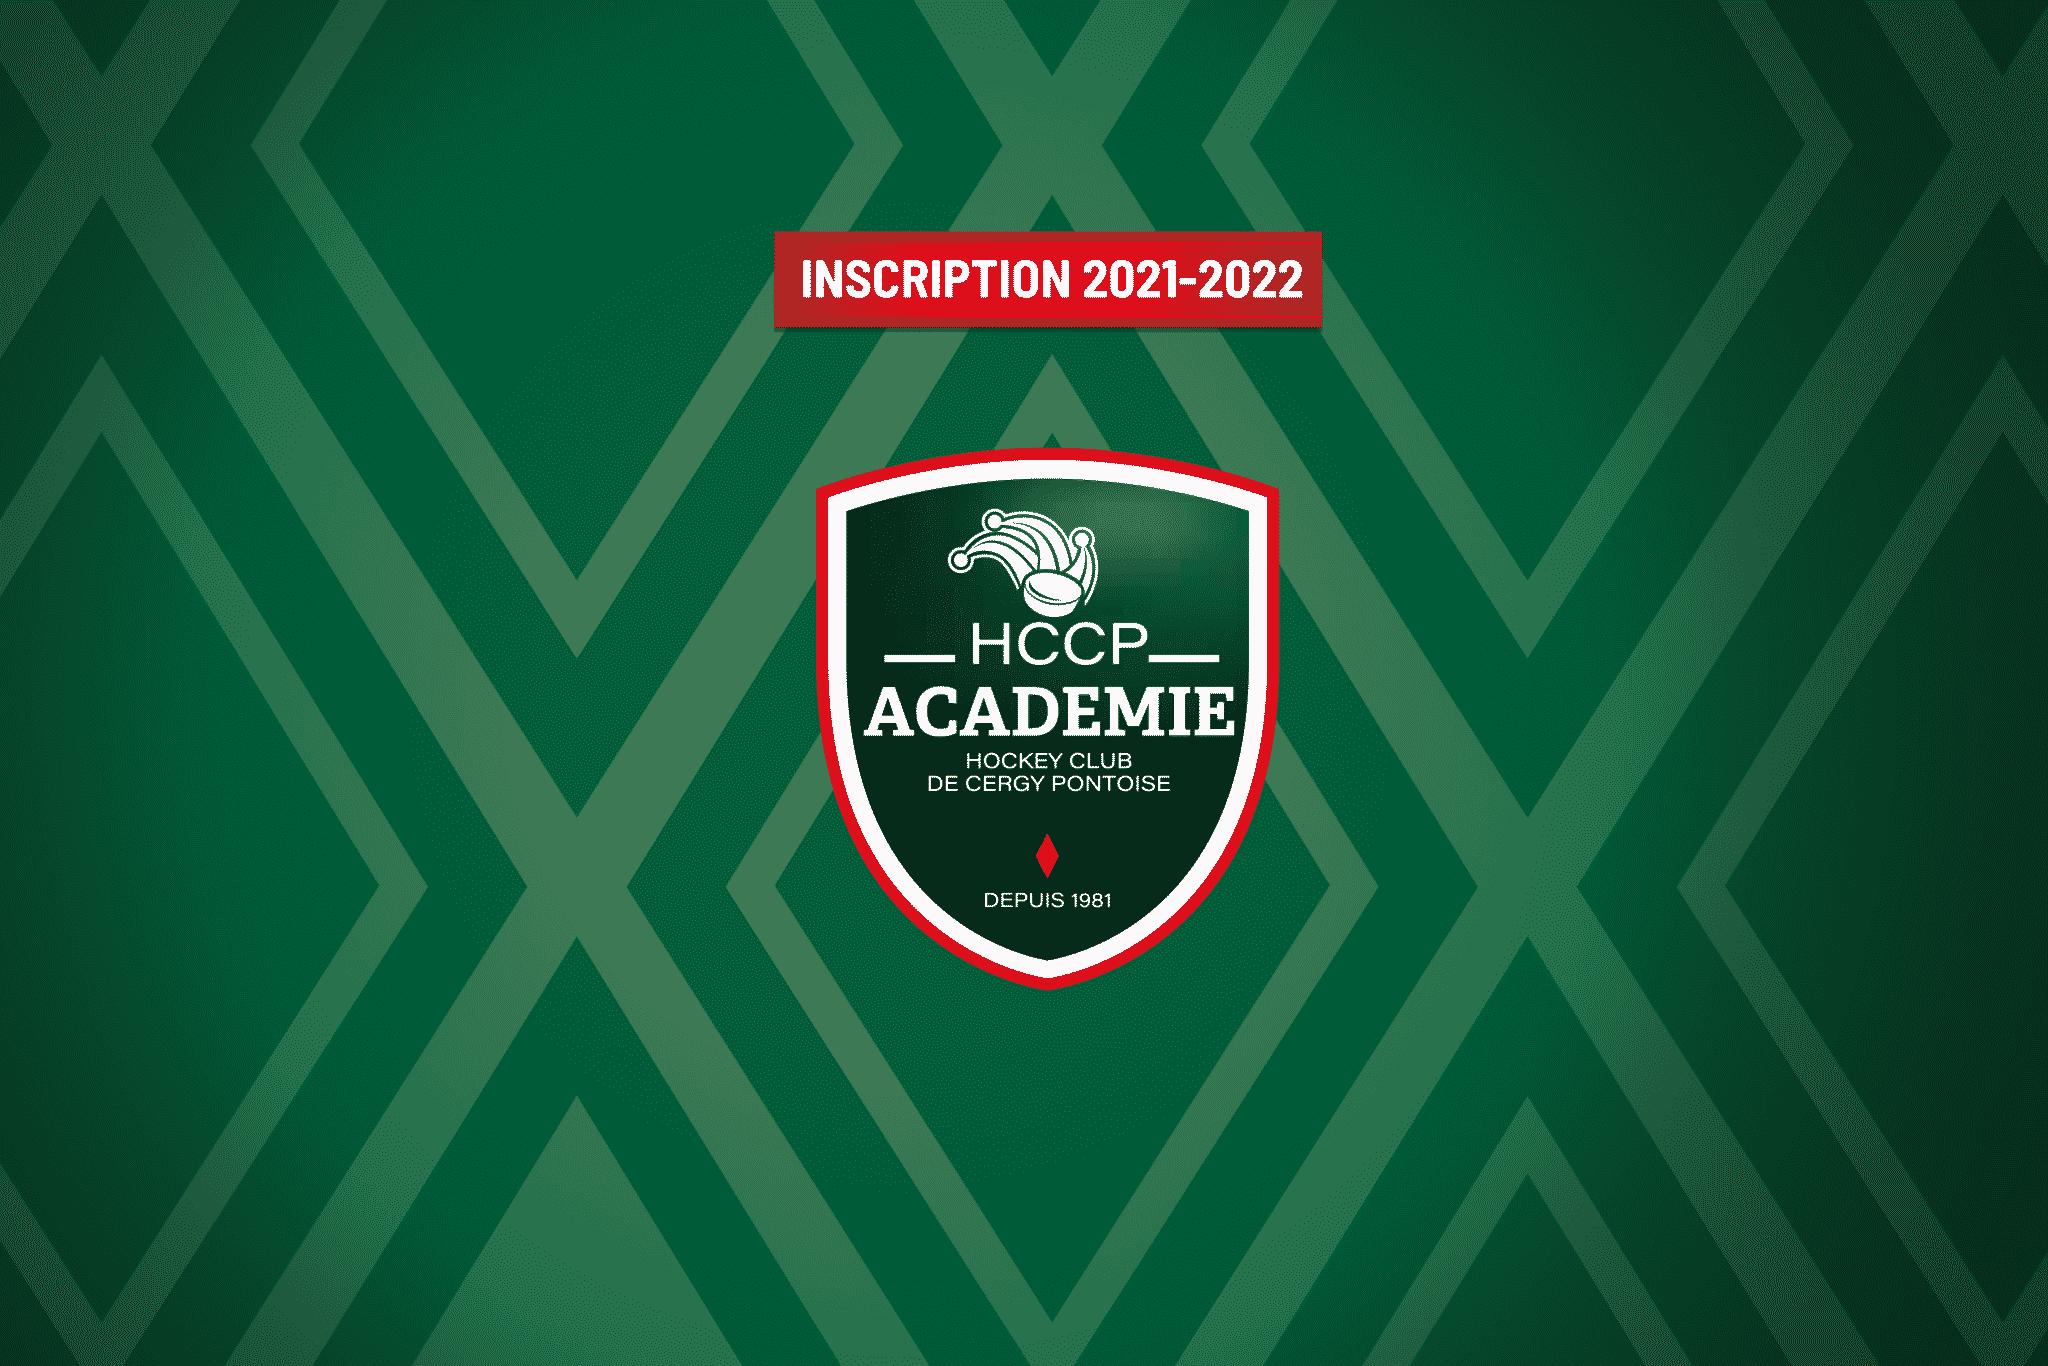 Saison académie 2021-2022